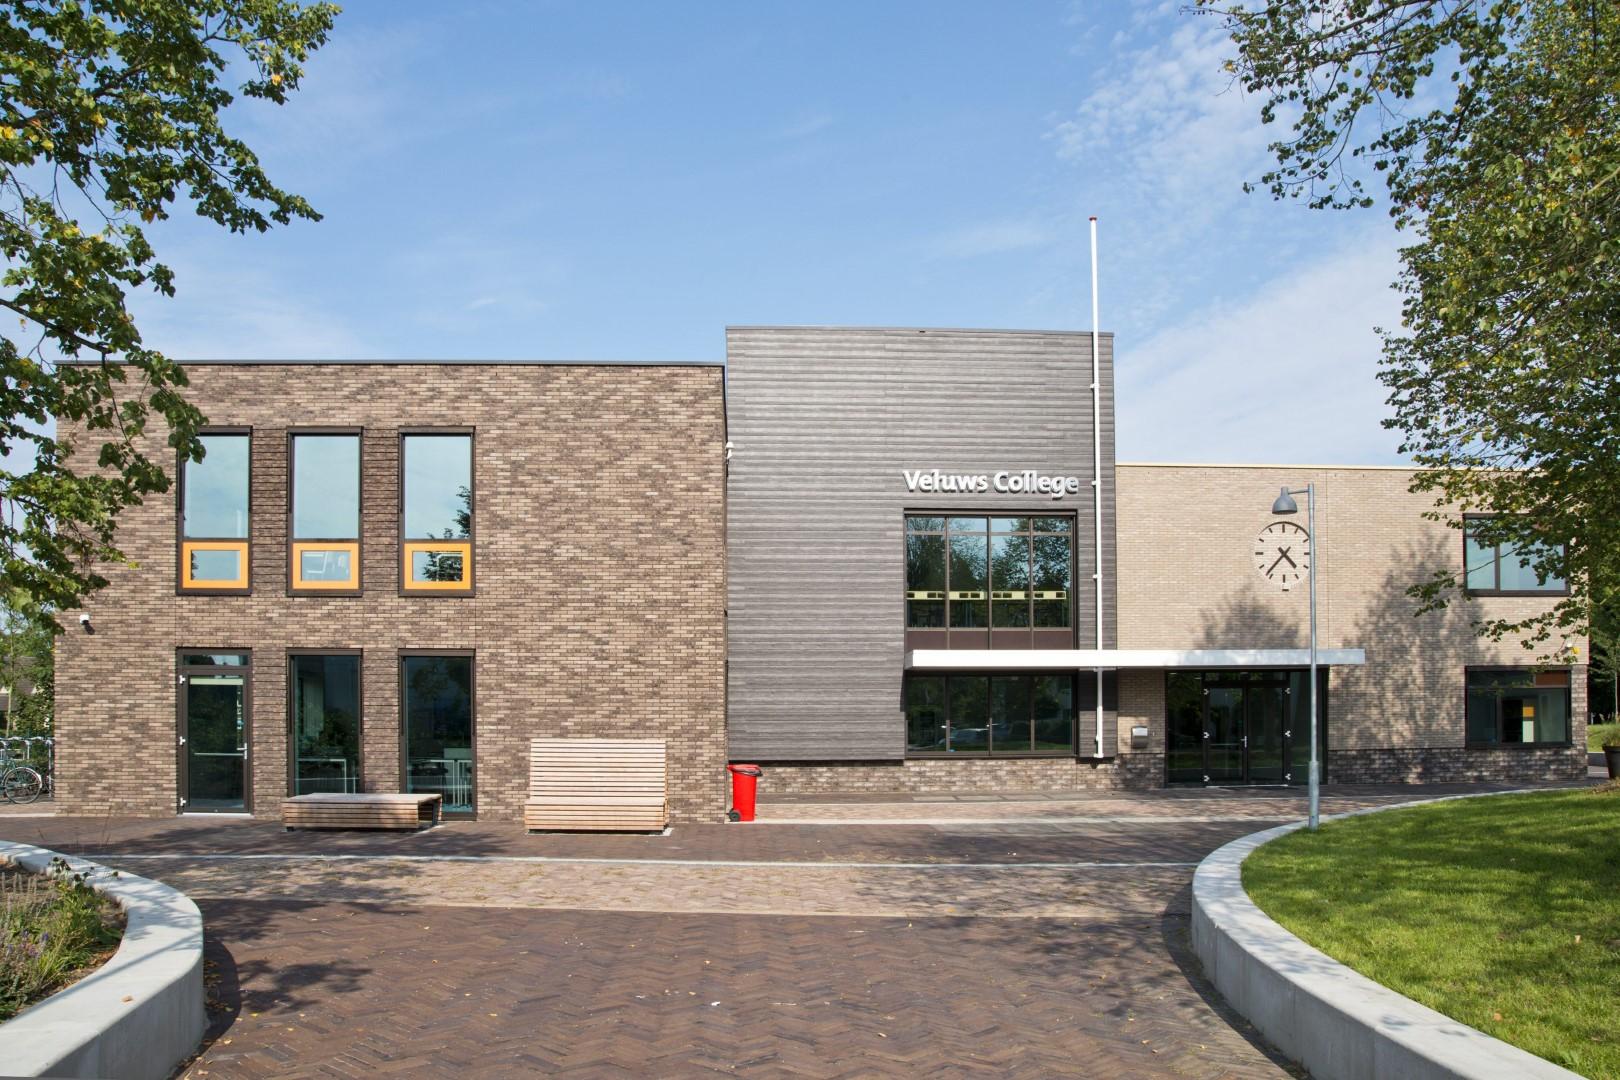 Veluws College Twello gebouw